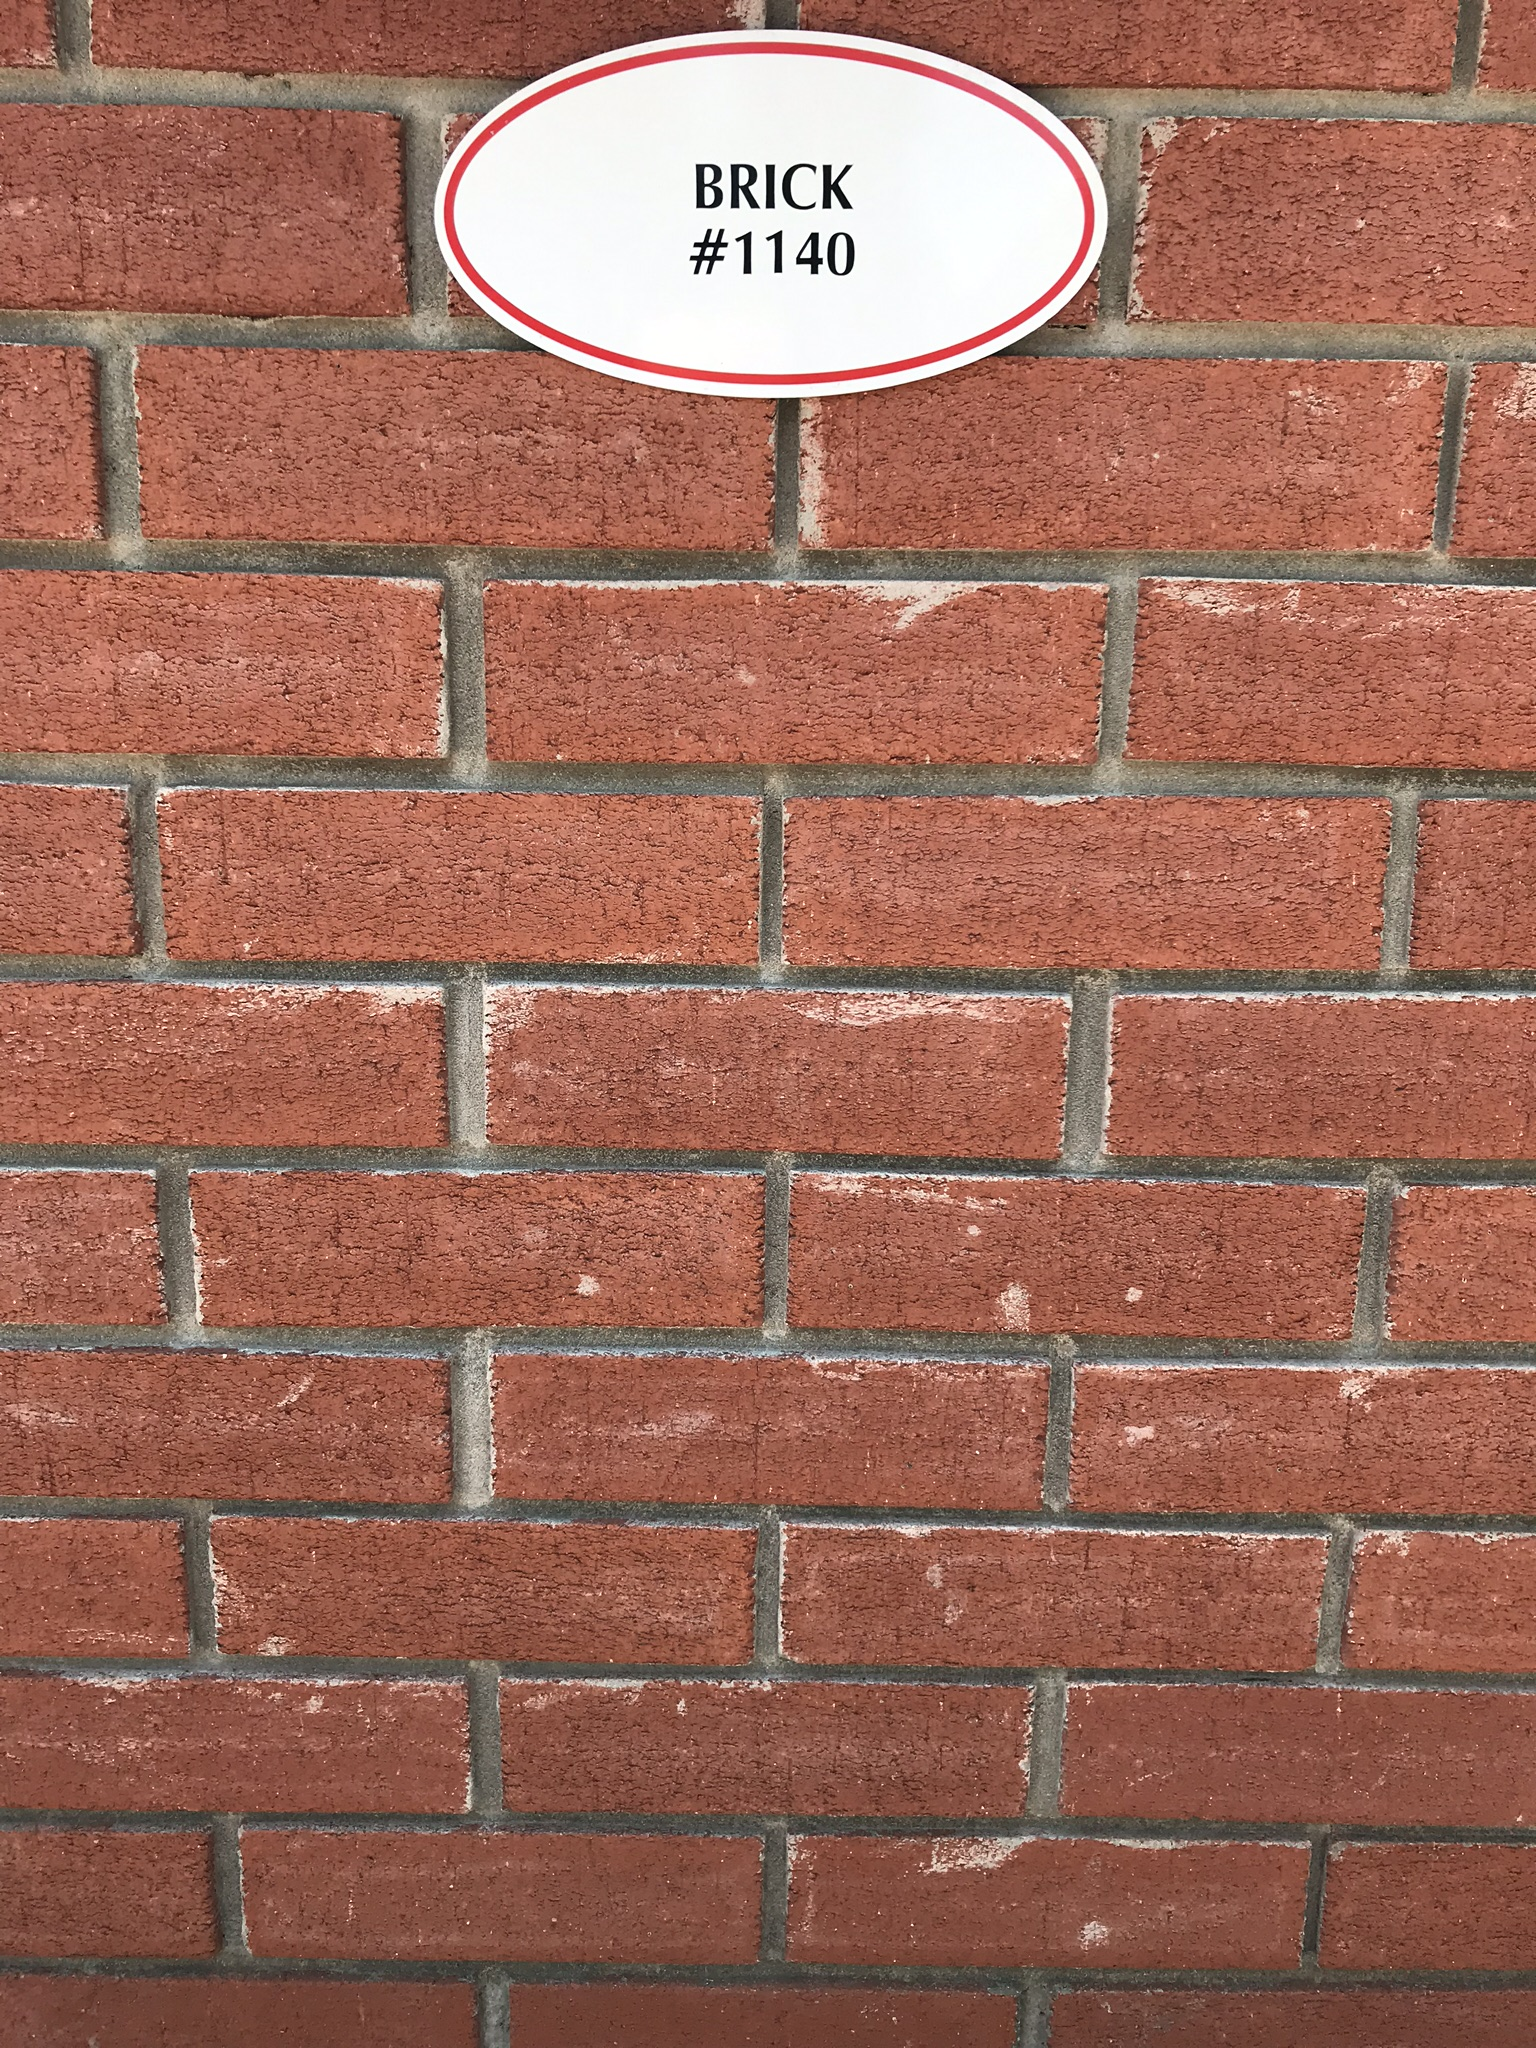 Brick #1140